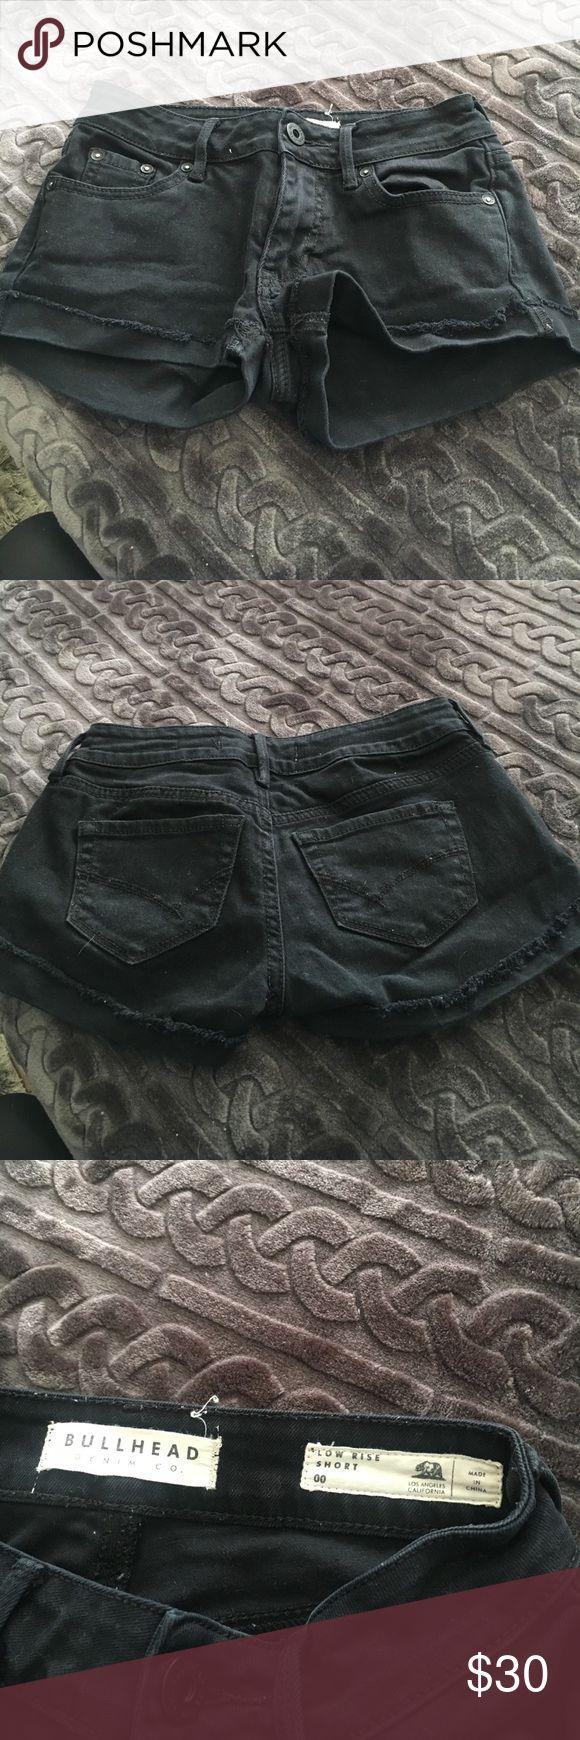 Bullhead black jean shorts Bullhead black jean shorts low rise size 00 cuffed at bottom Shorts Jean Shorts